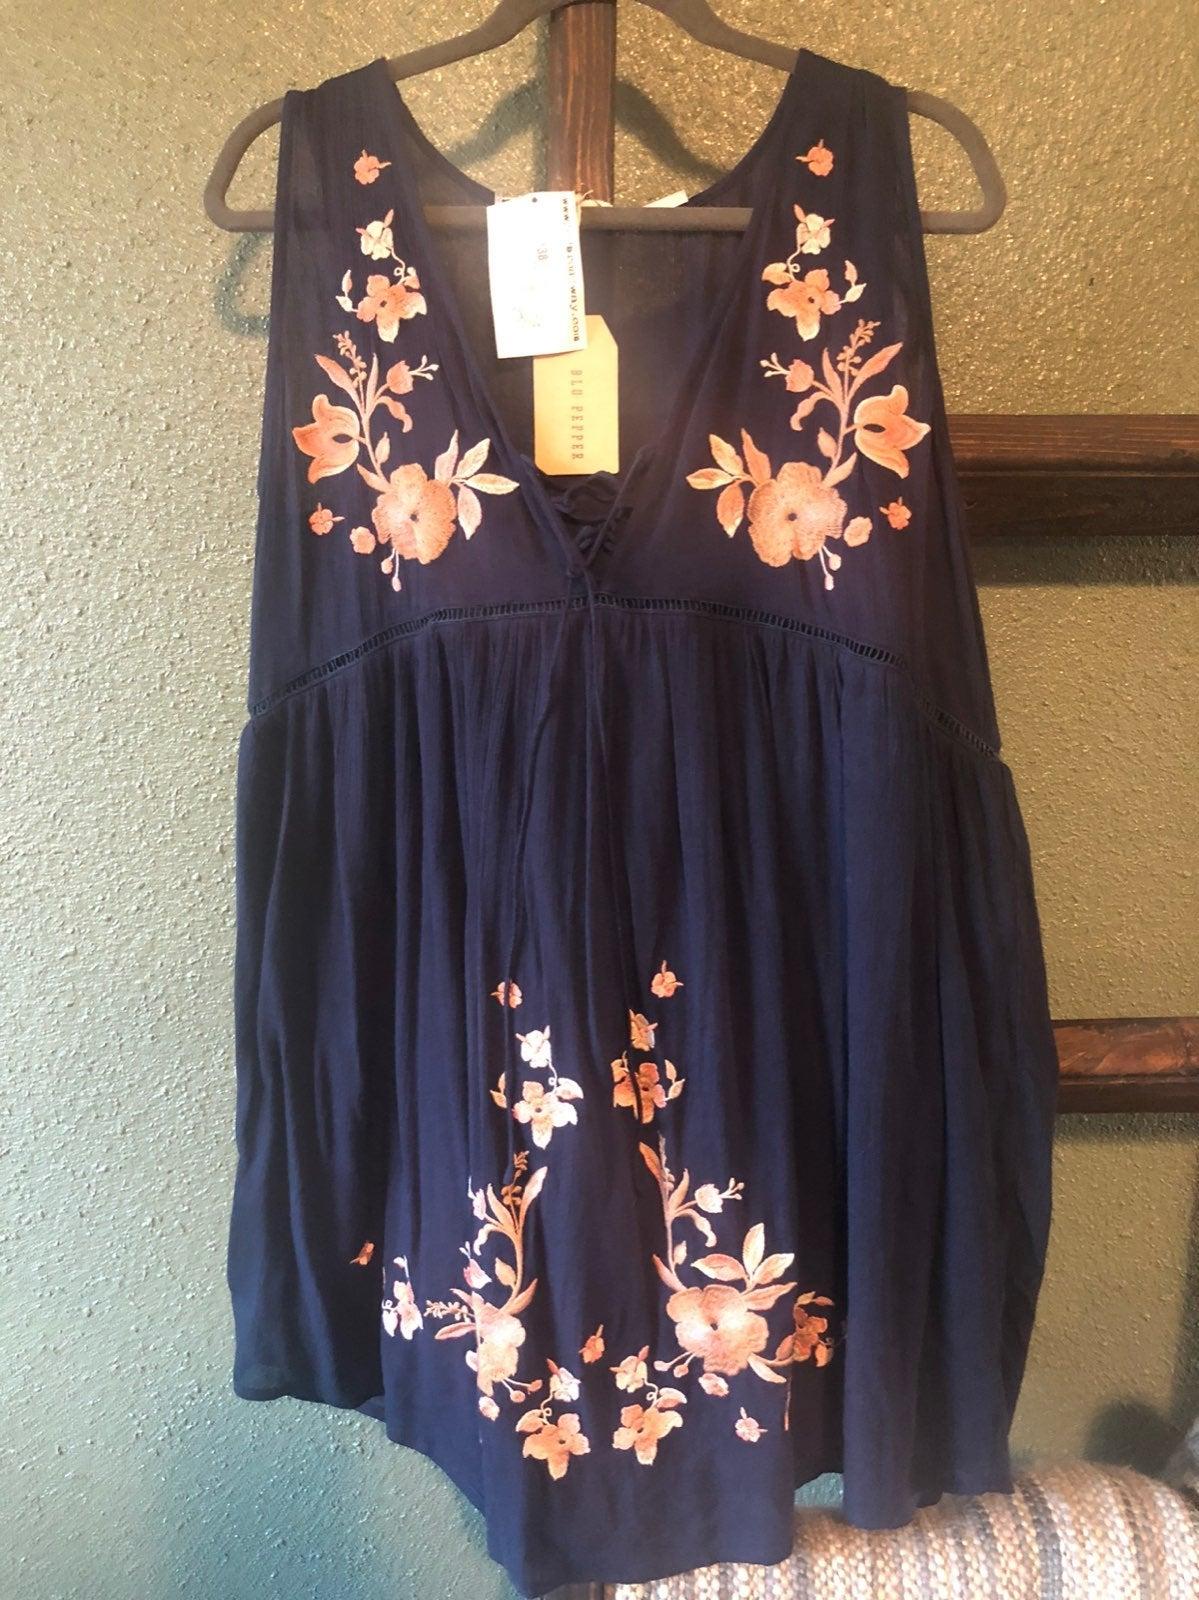 Blue dress with pink floral design!